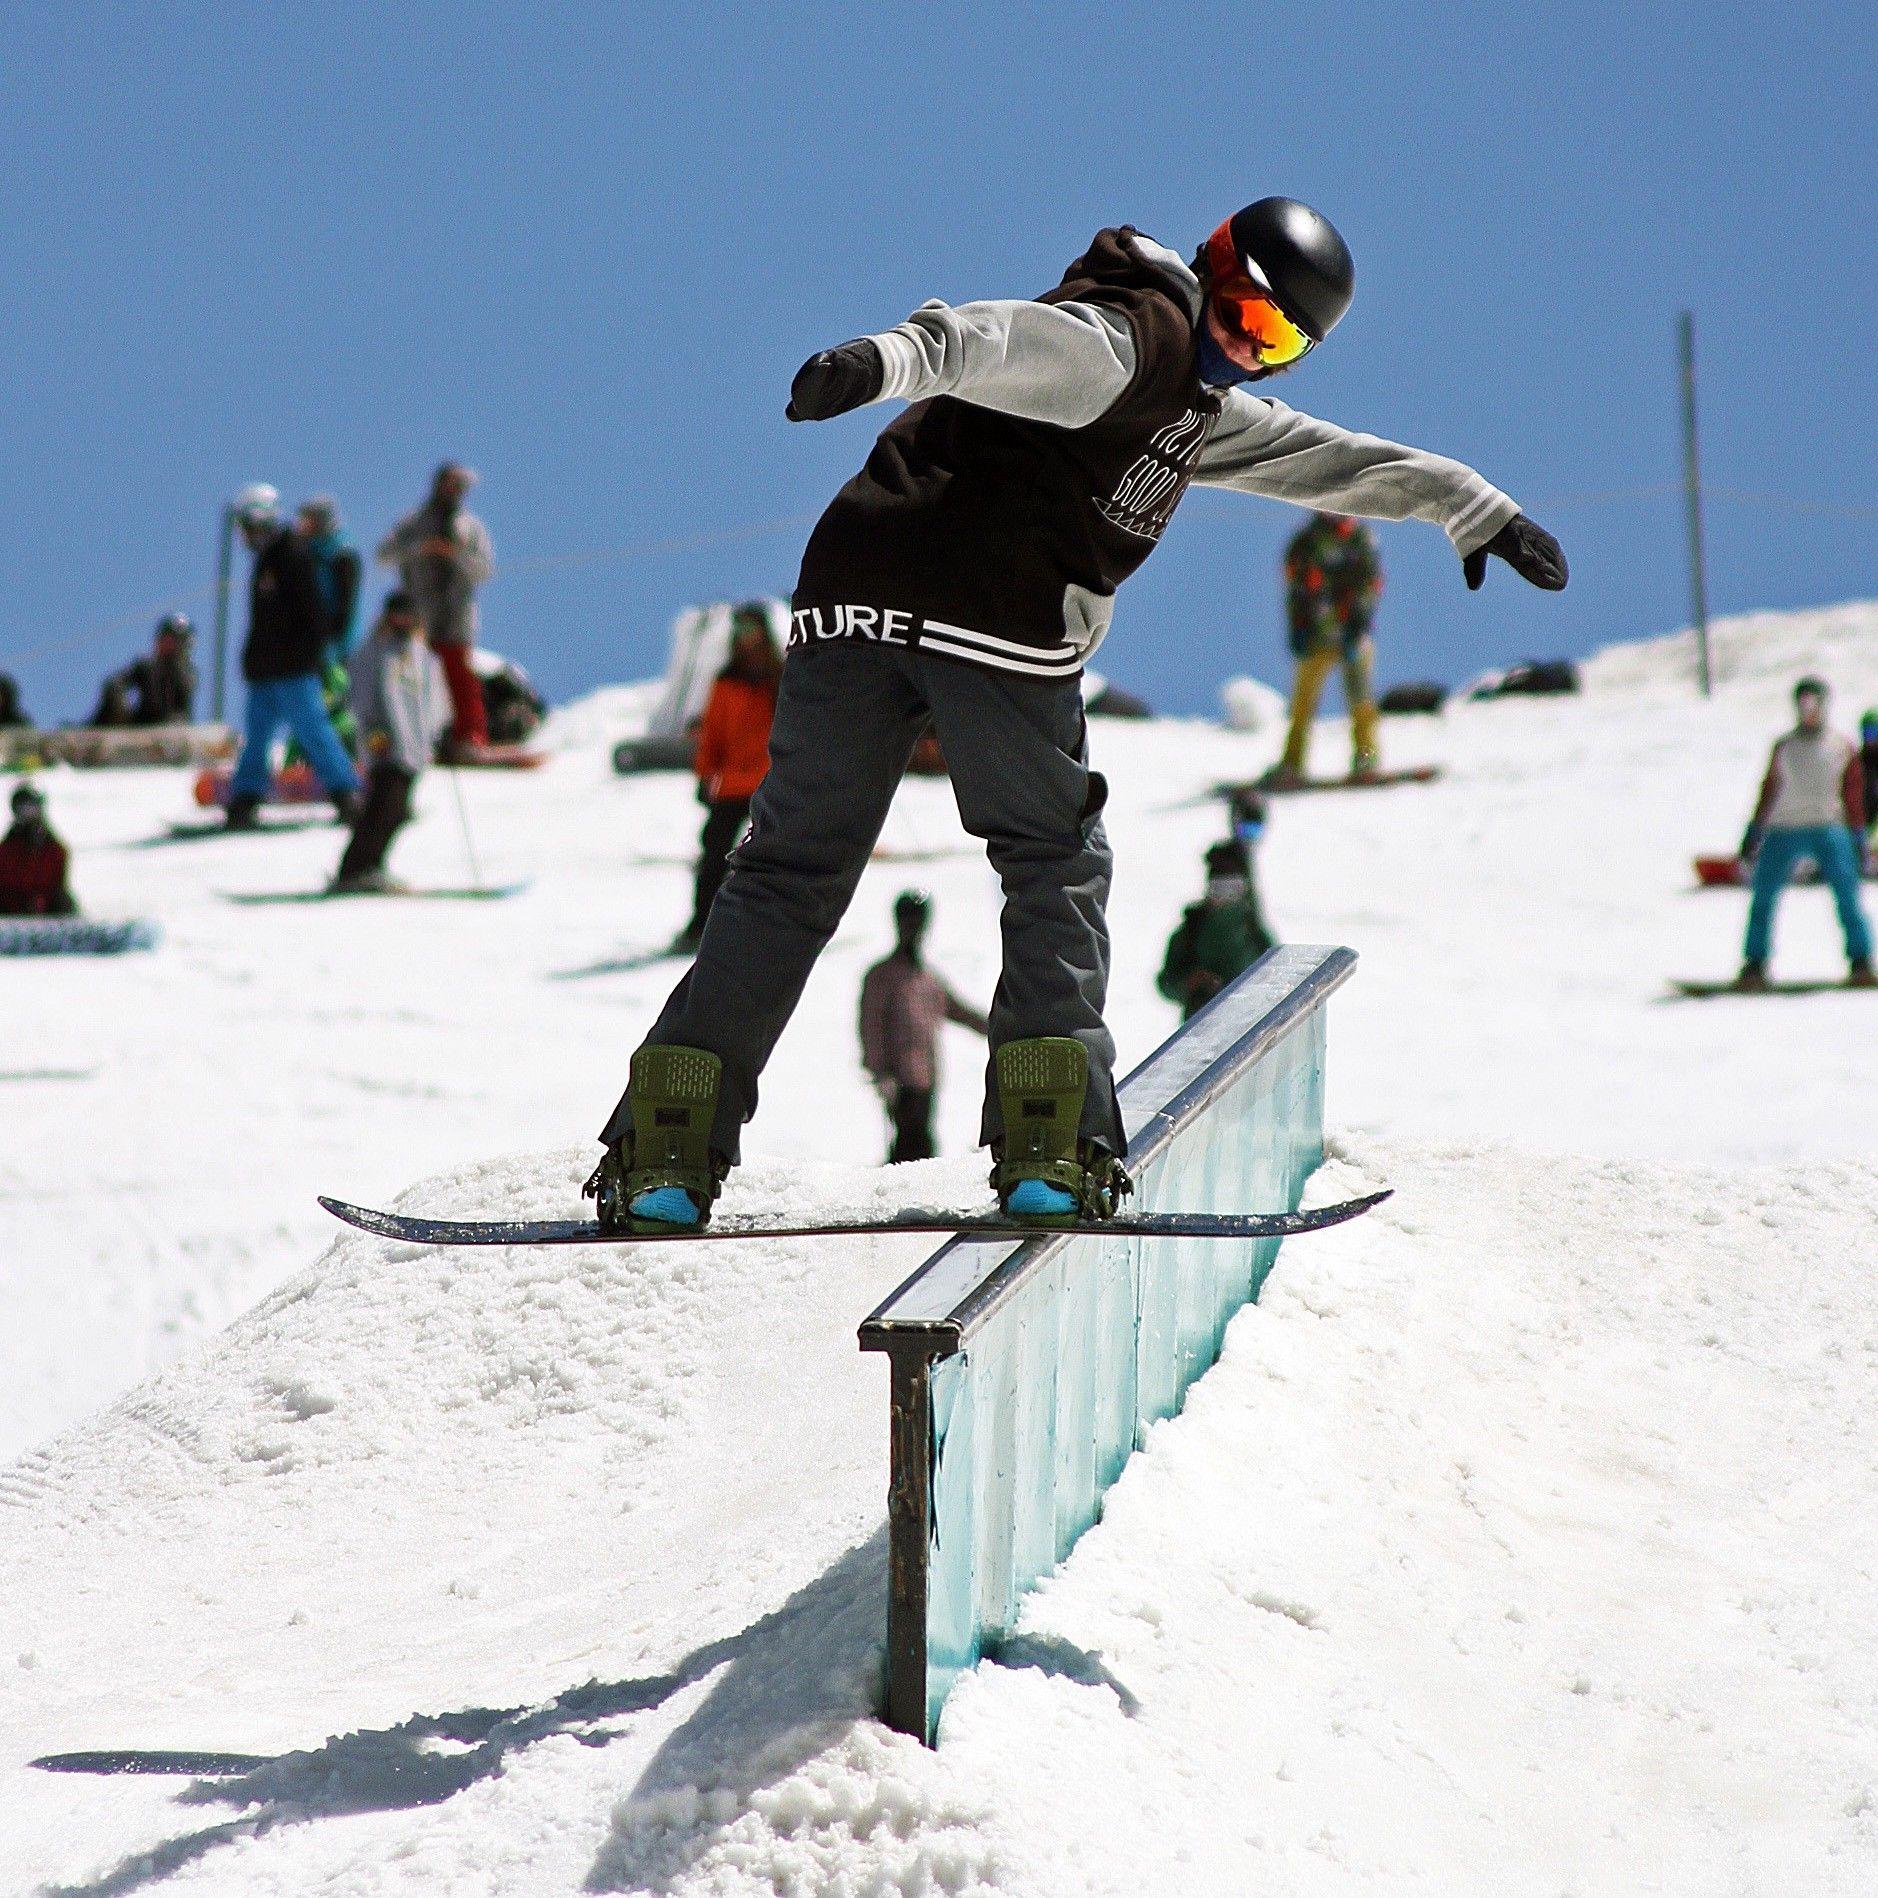 The Keys To Dialling A Frontside Boardslide On A Snowboard Snowboard Snowboarding Dial